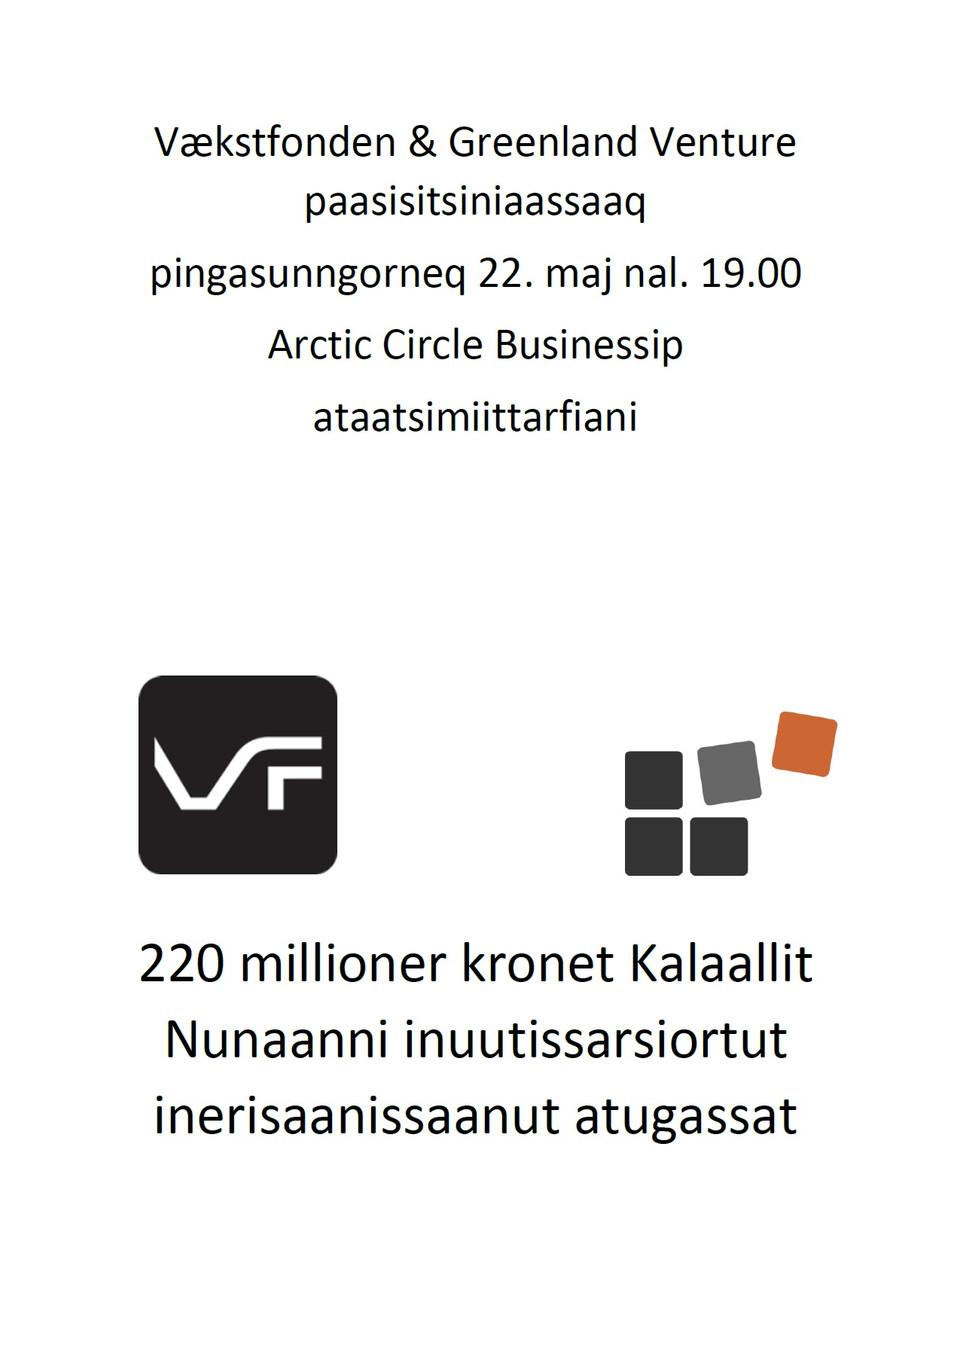 Vækstfonden & Greenland Venture afholder informationsmøde